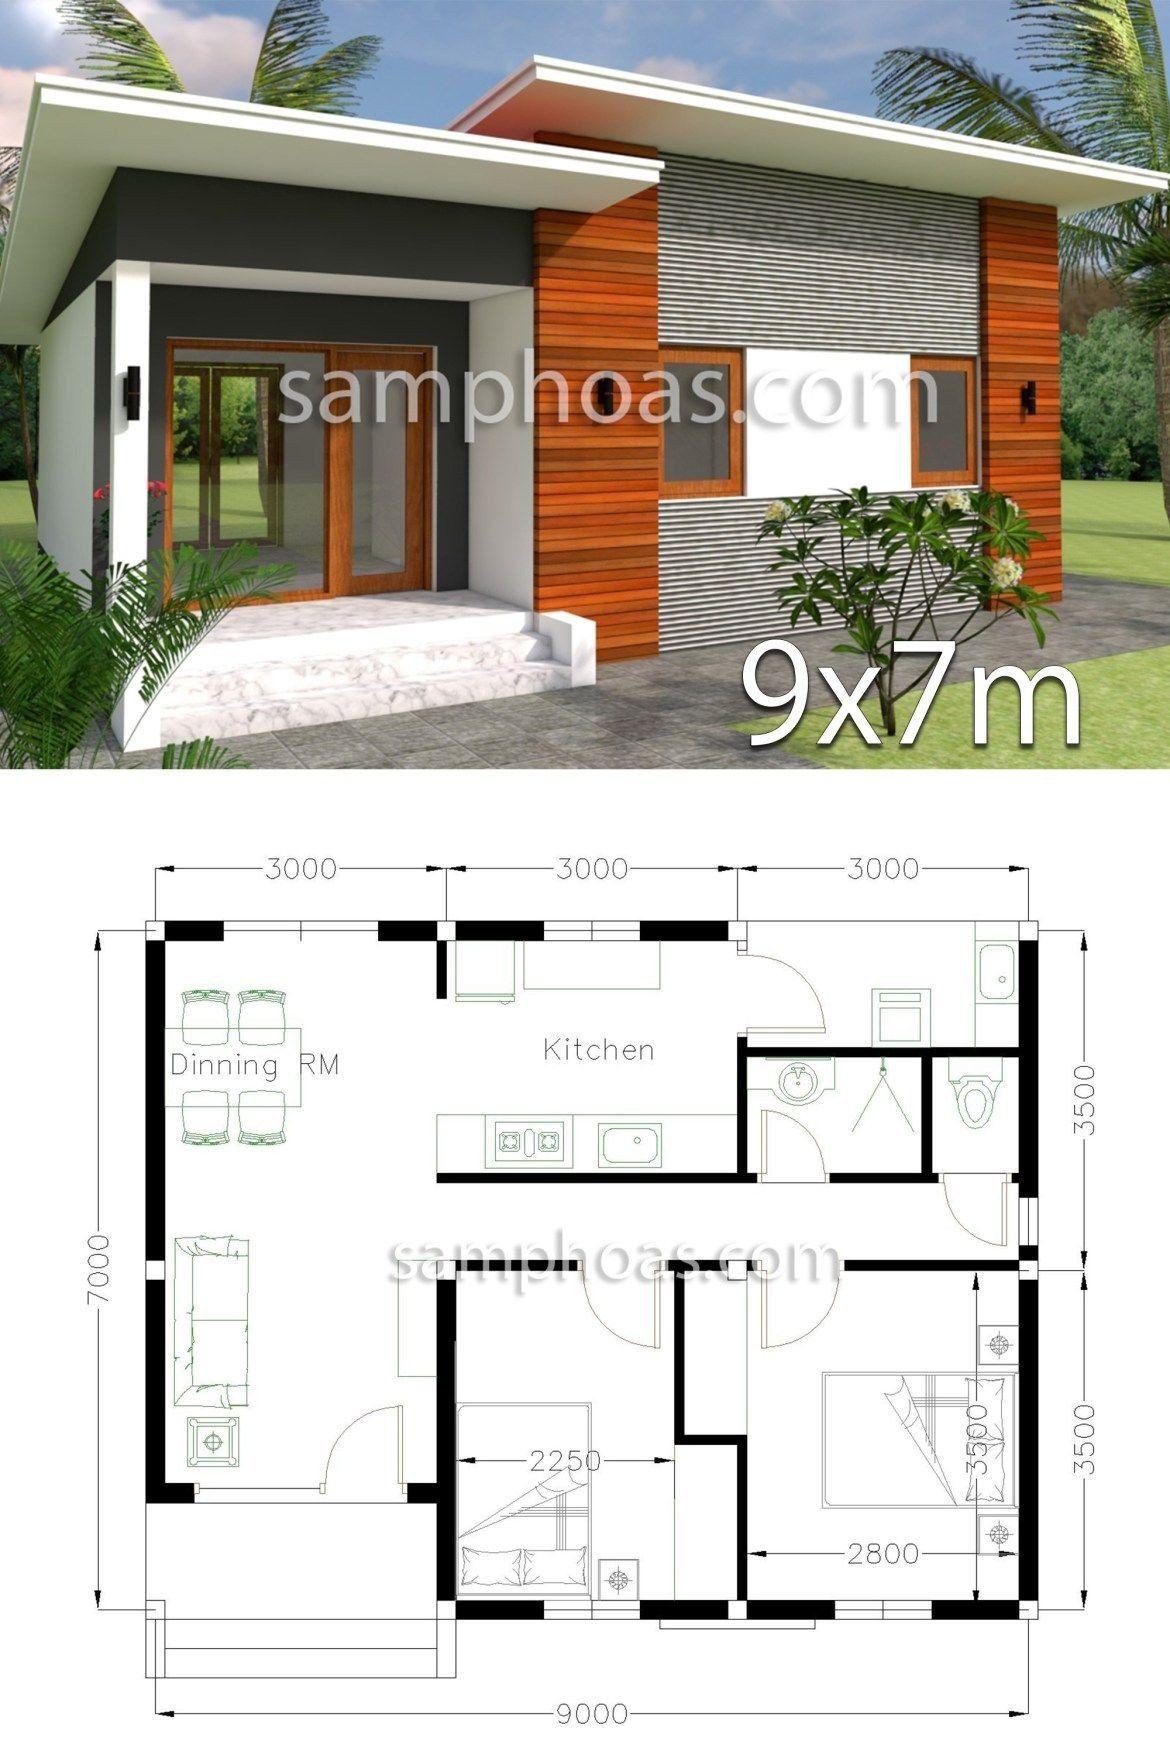 Modern House Design Ground Floor Plan 3d Home Design 9x7m 2 Bedrooms House Designs Exterior Modern House Plans Small House Design